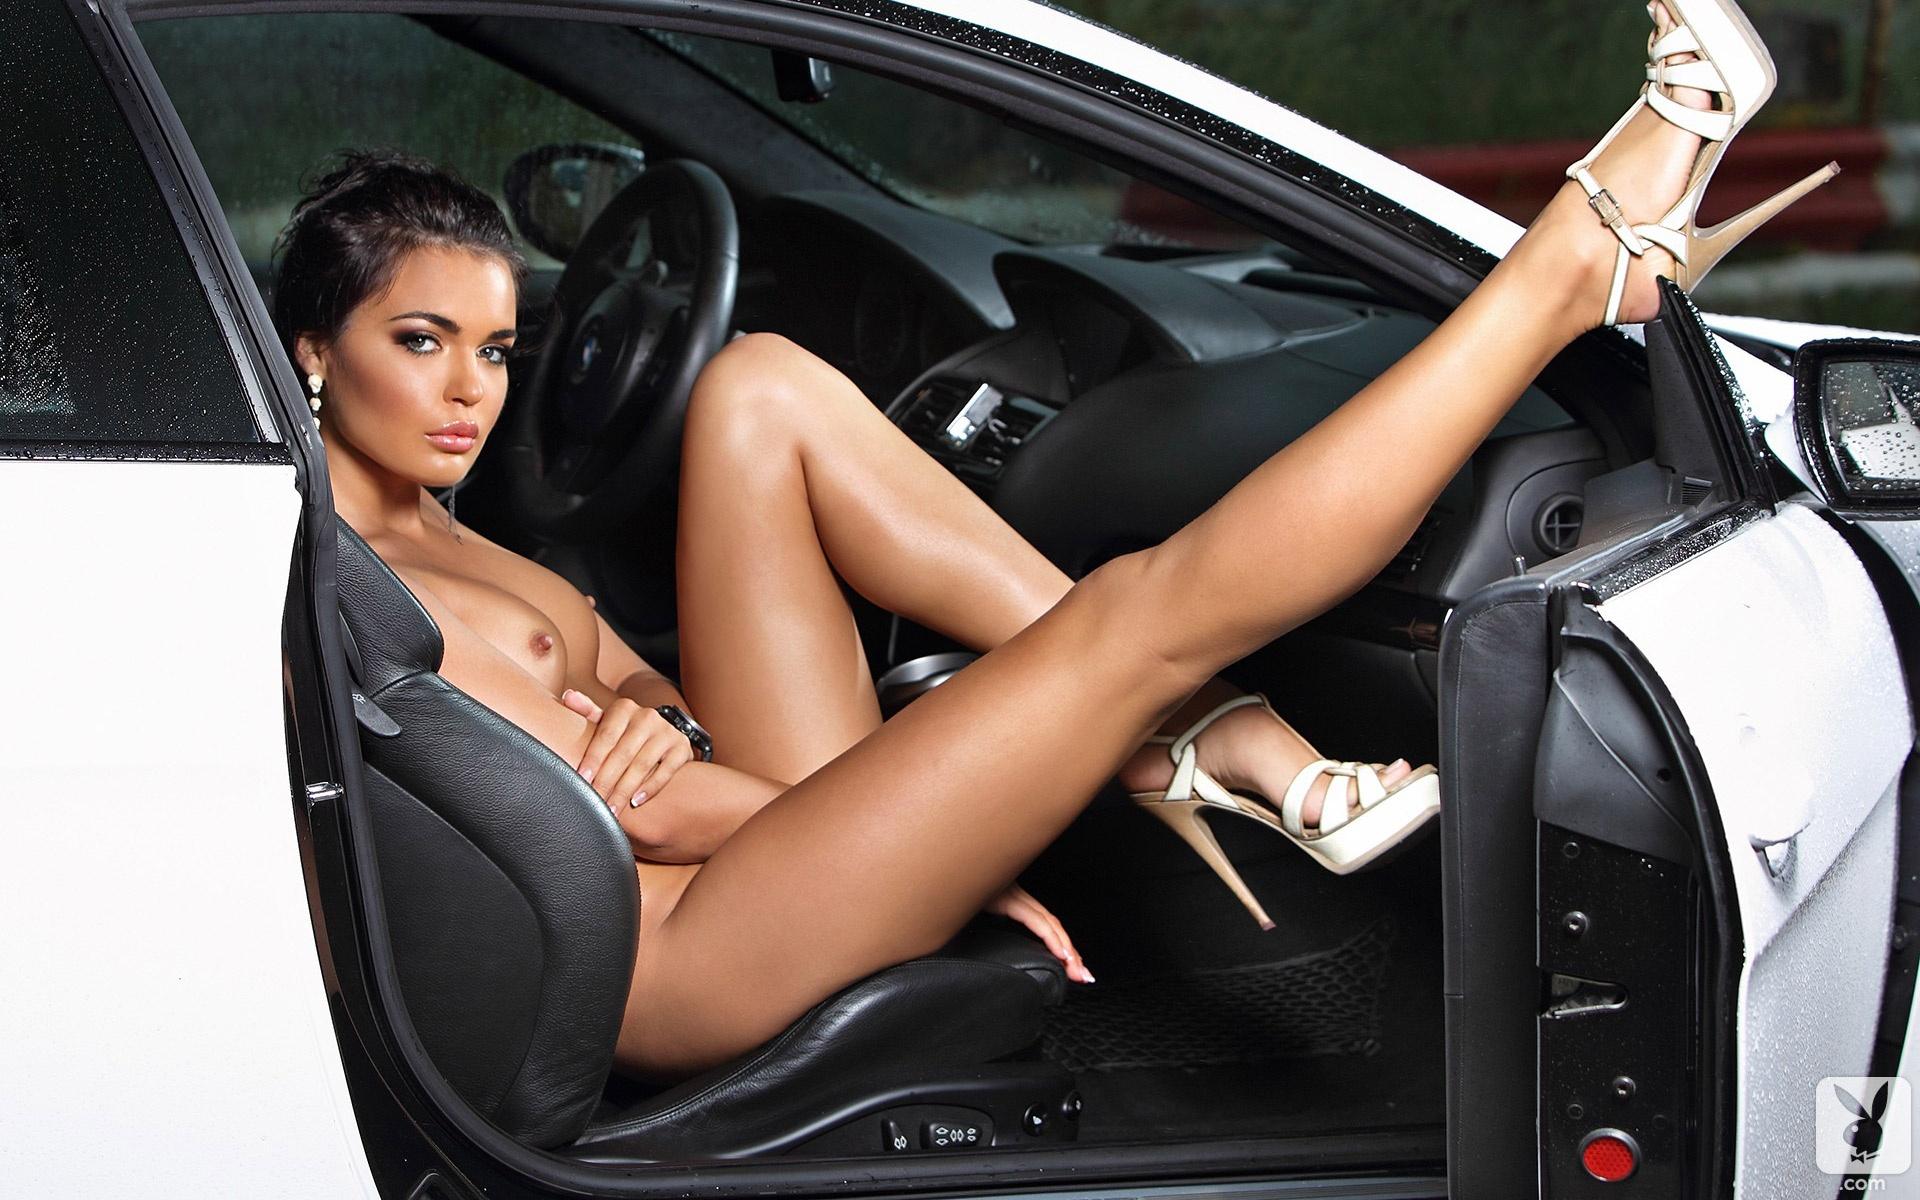 naked race car driver pics